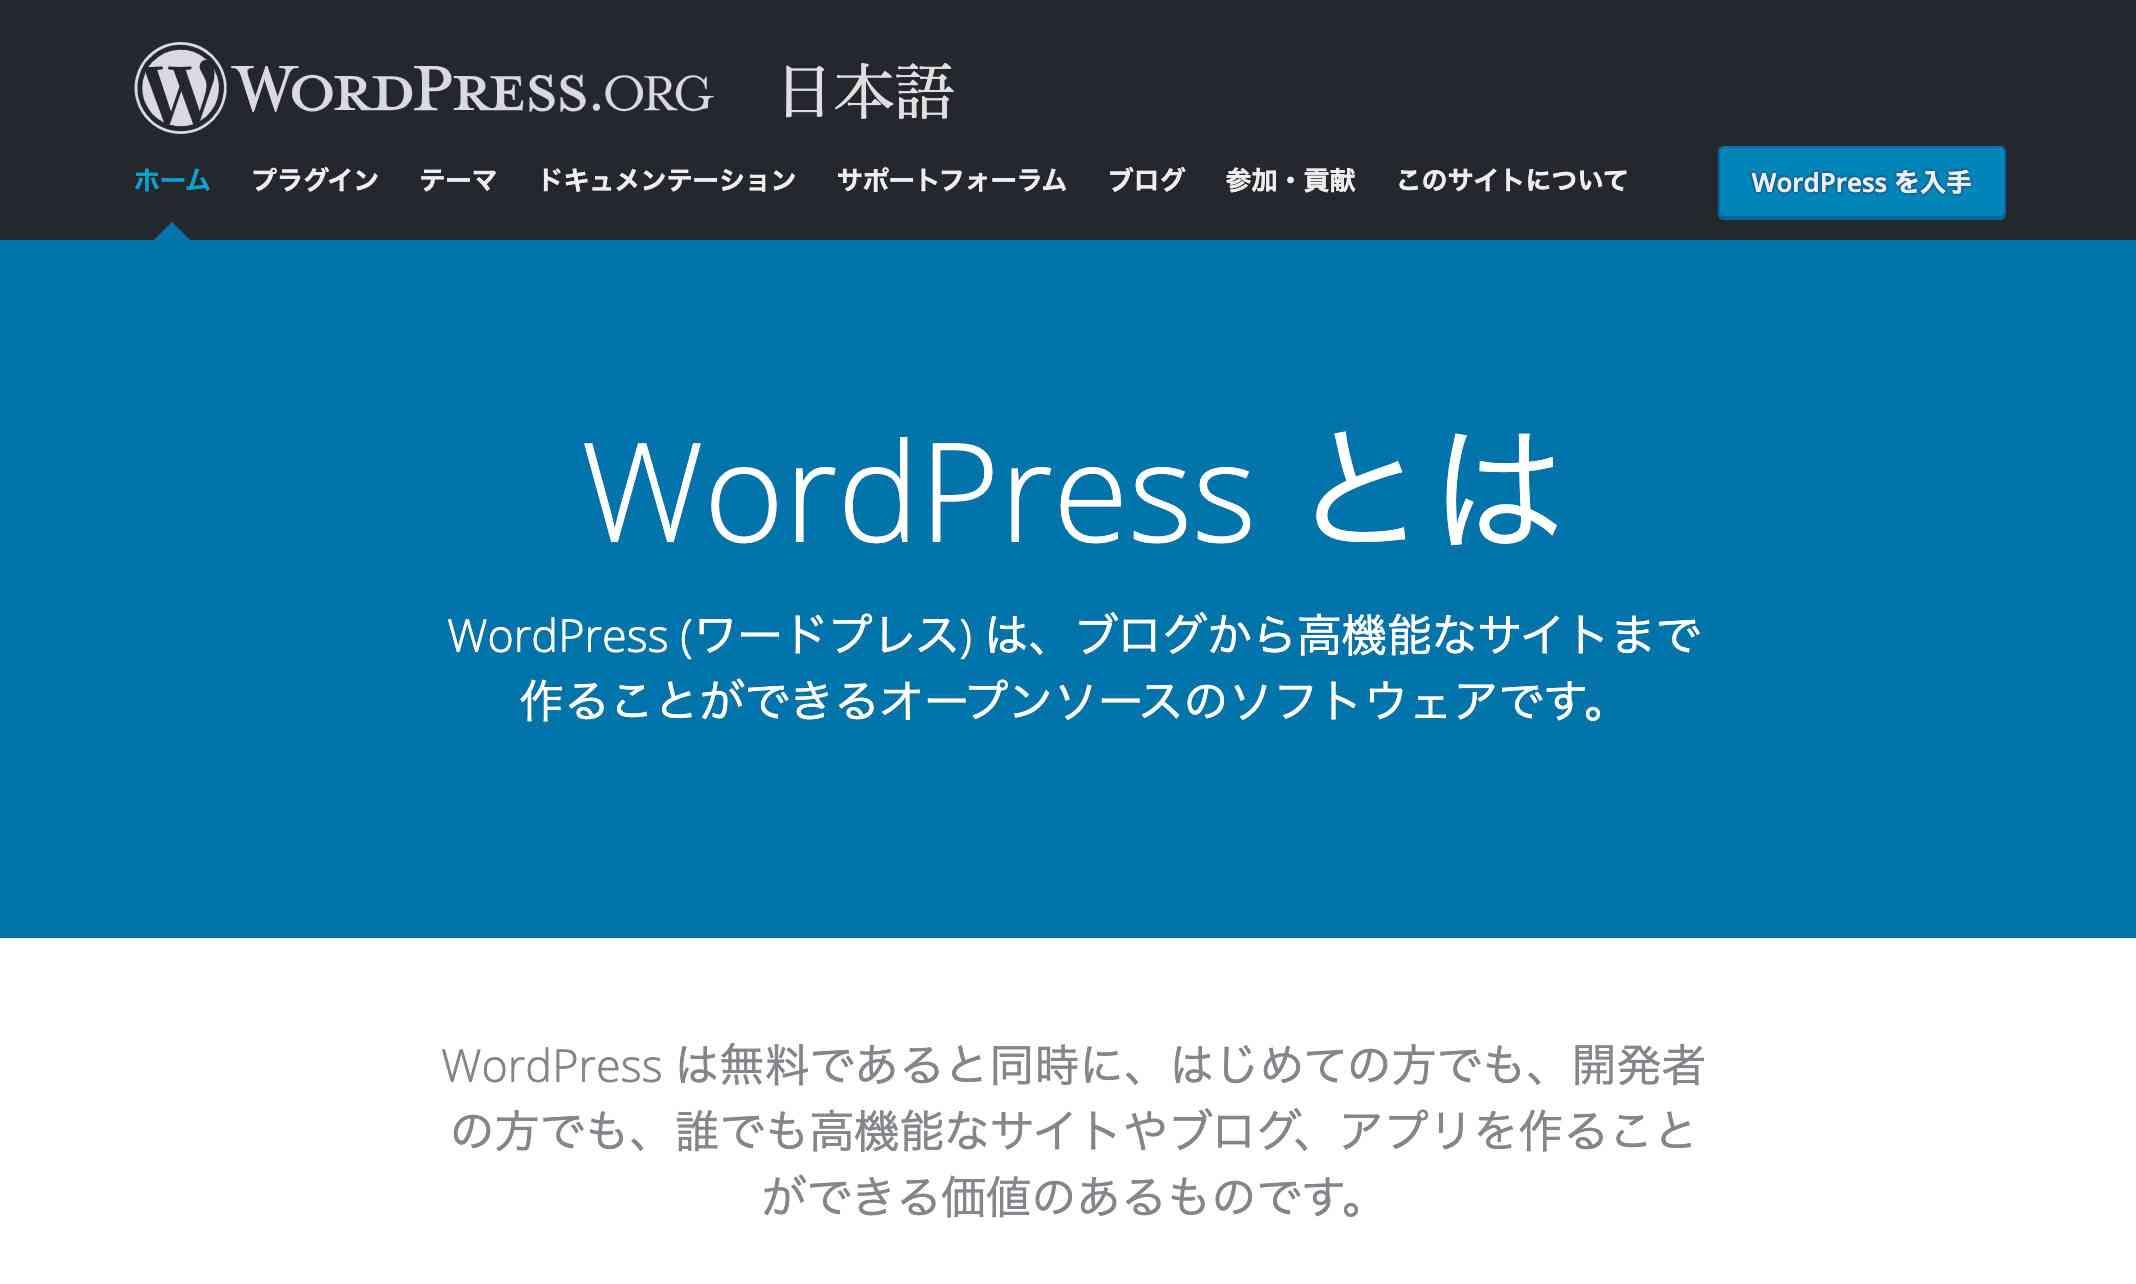 WordPressとは